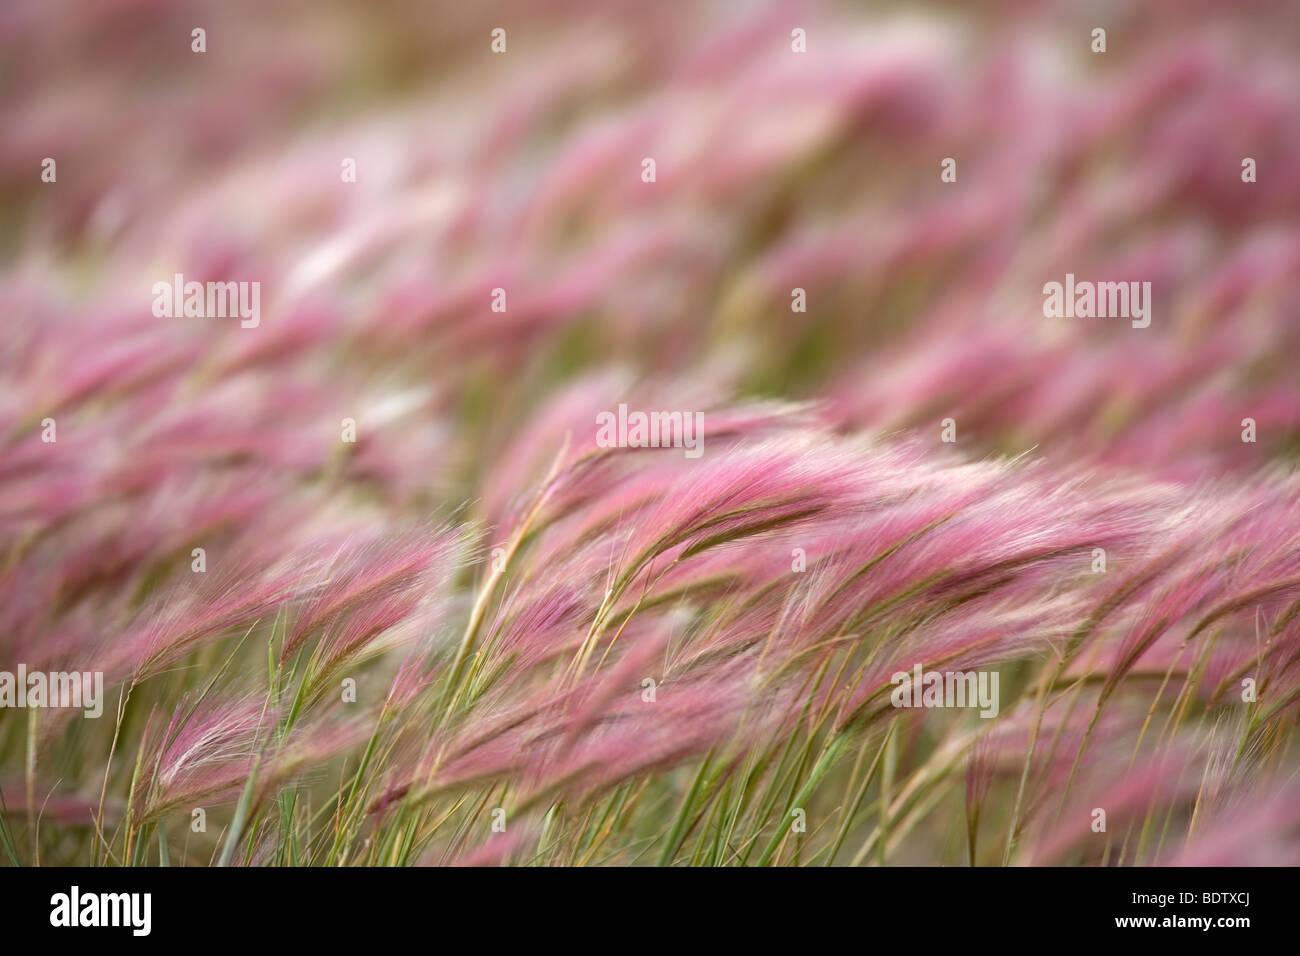 Maehnen-Gerste / Orge / Hordeum jubatum Photo Stock